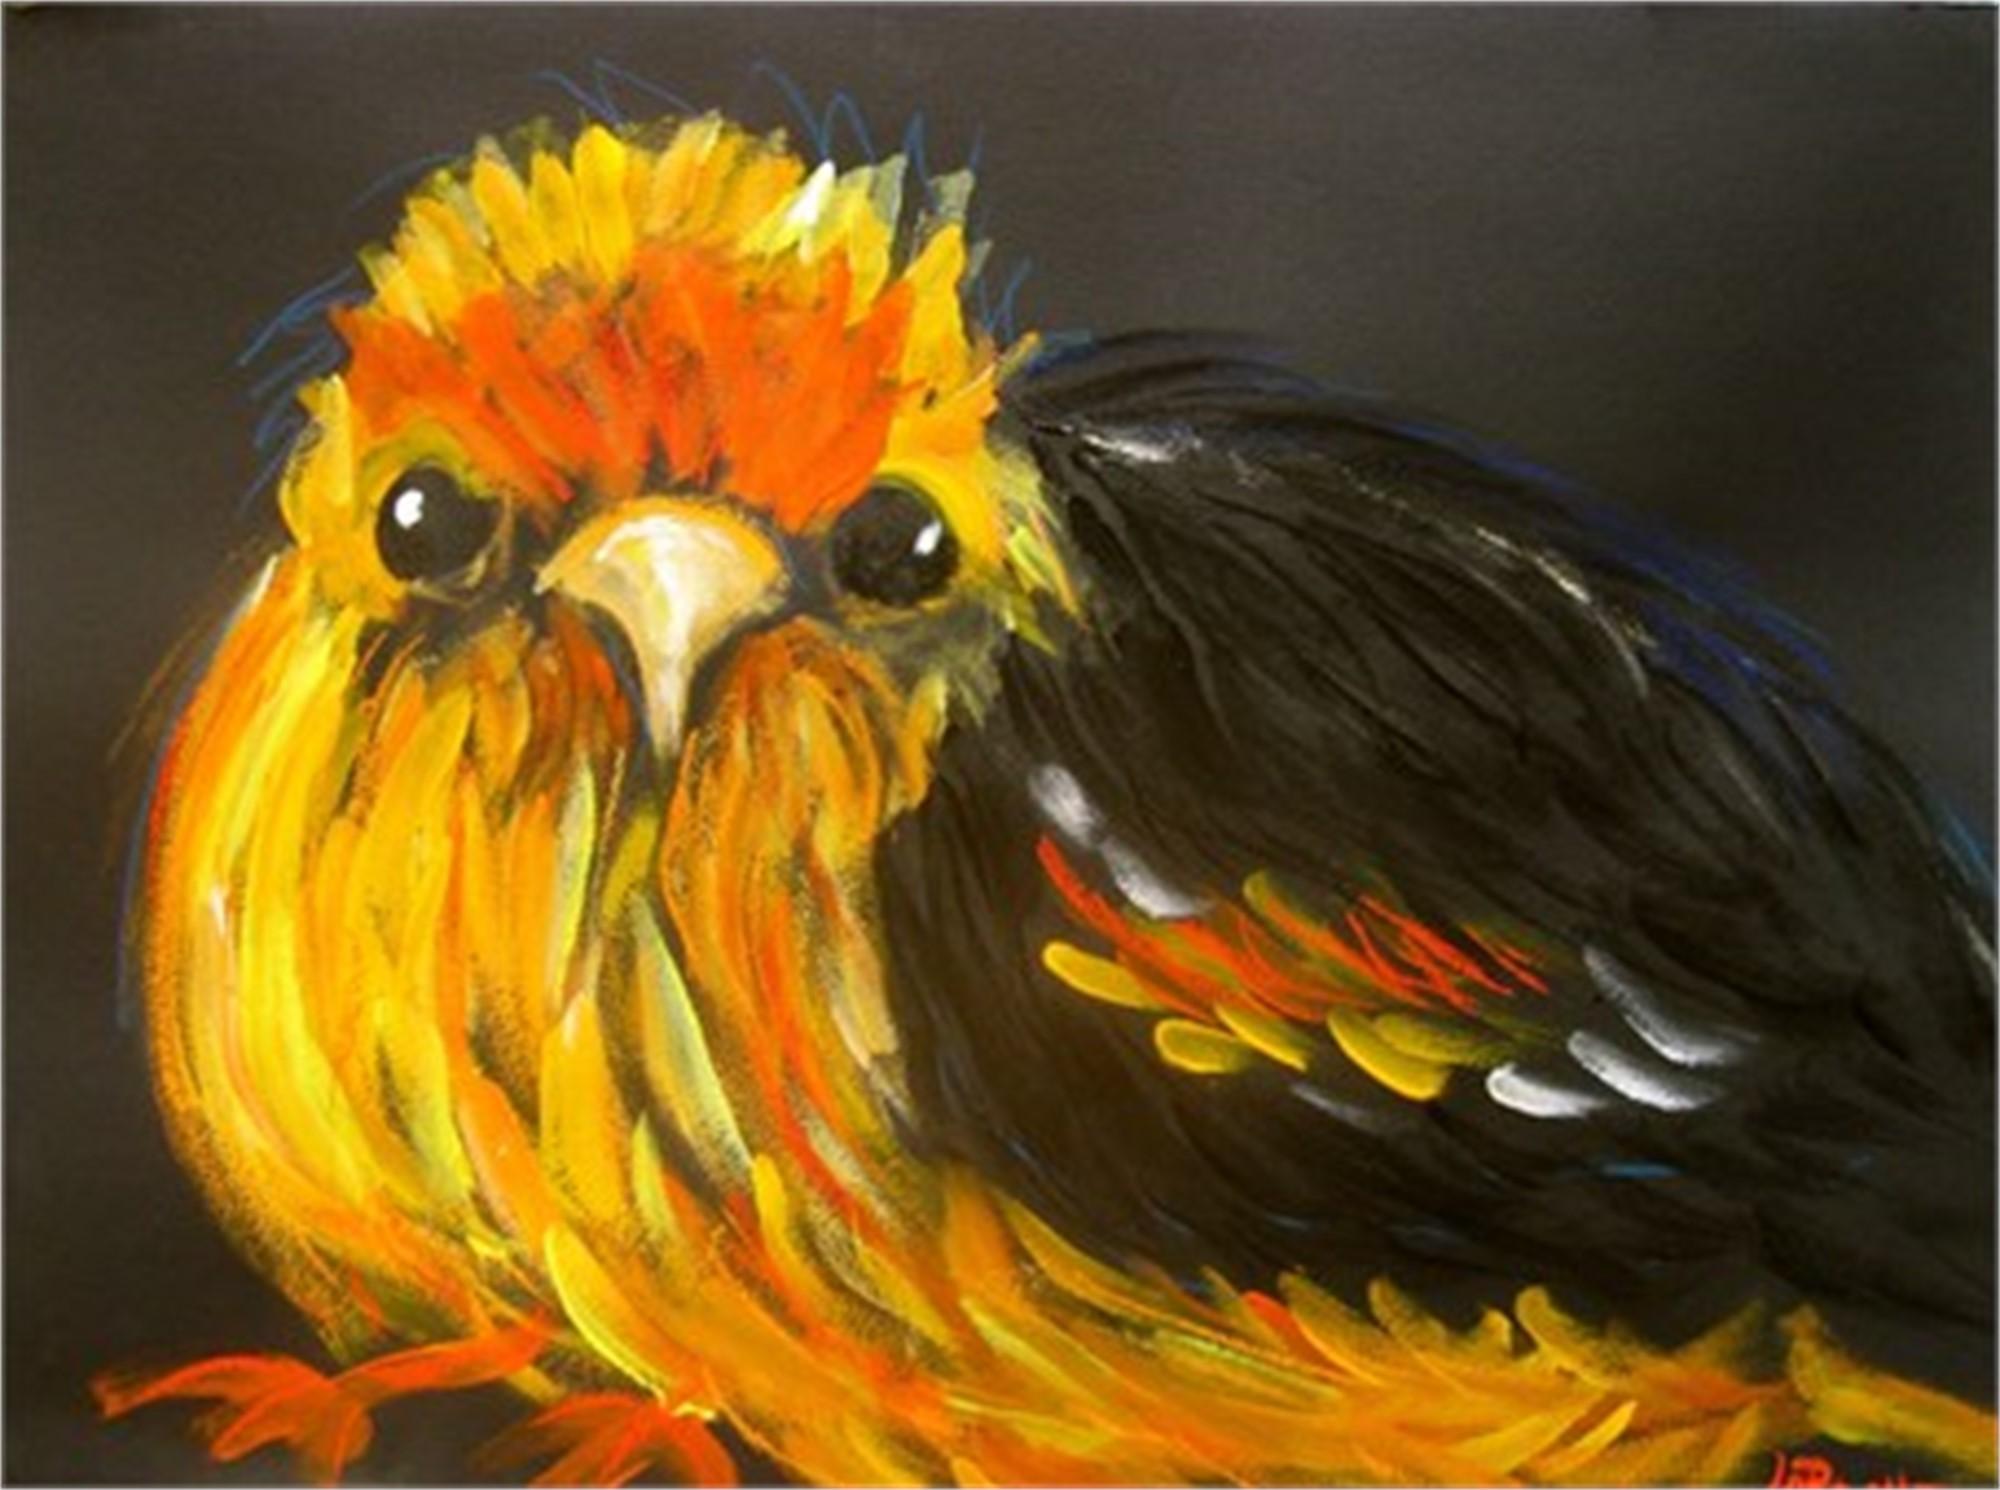 WILD YELLOW BIRD by Carole LaRoche